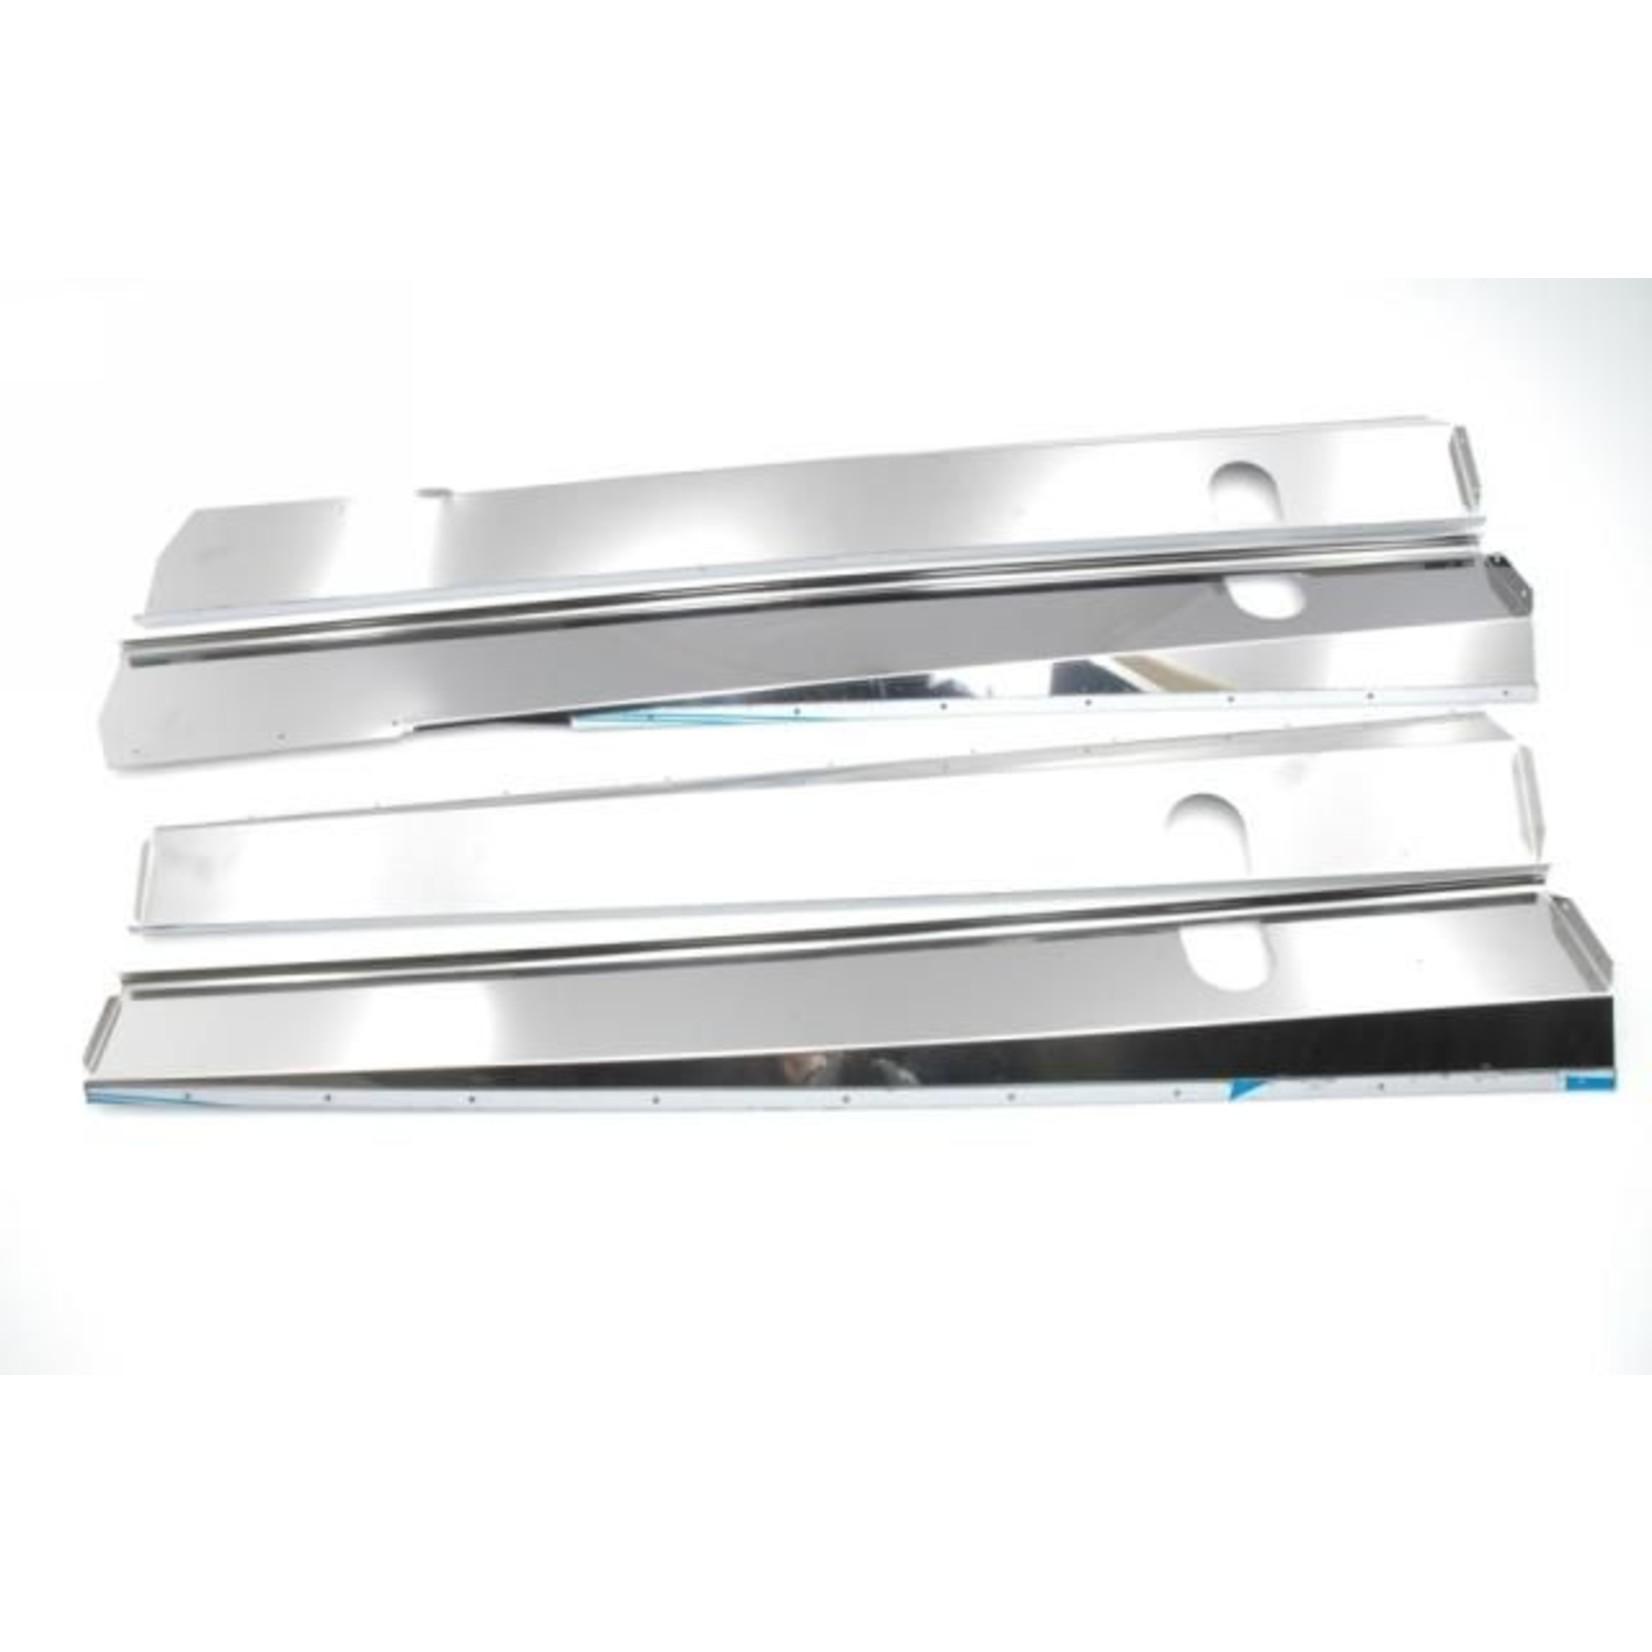 Chapas de caja Inox brillant break / cabriolet Nr Org: DS85363D